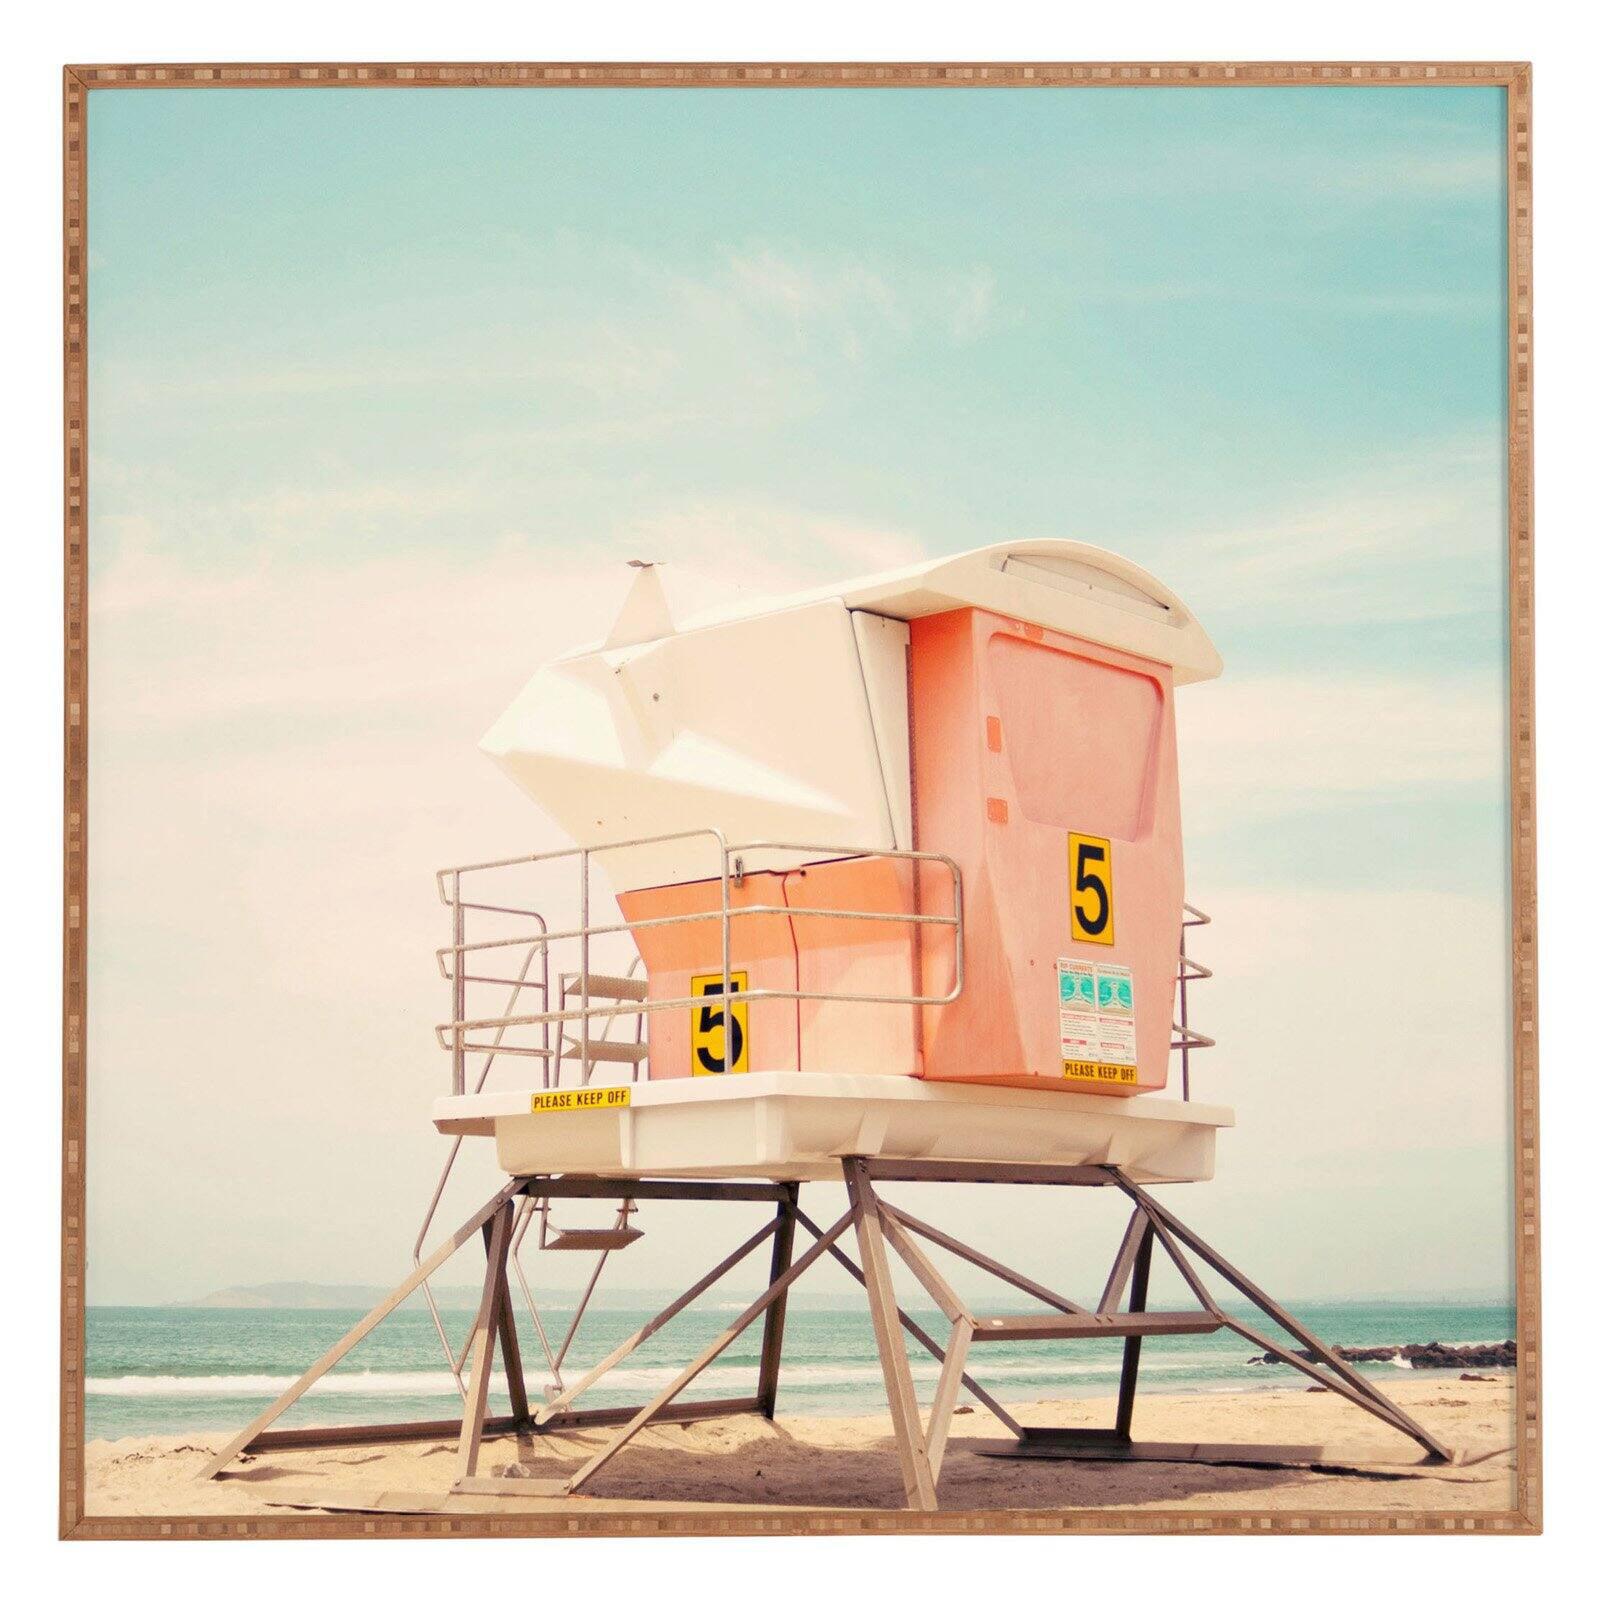 Deny Designs Bree Madden Beach Tower 5 Framed Wall Art Walmart Com Walmart Com